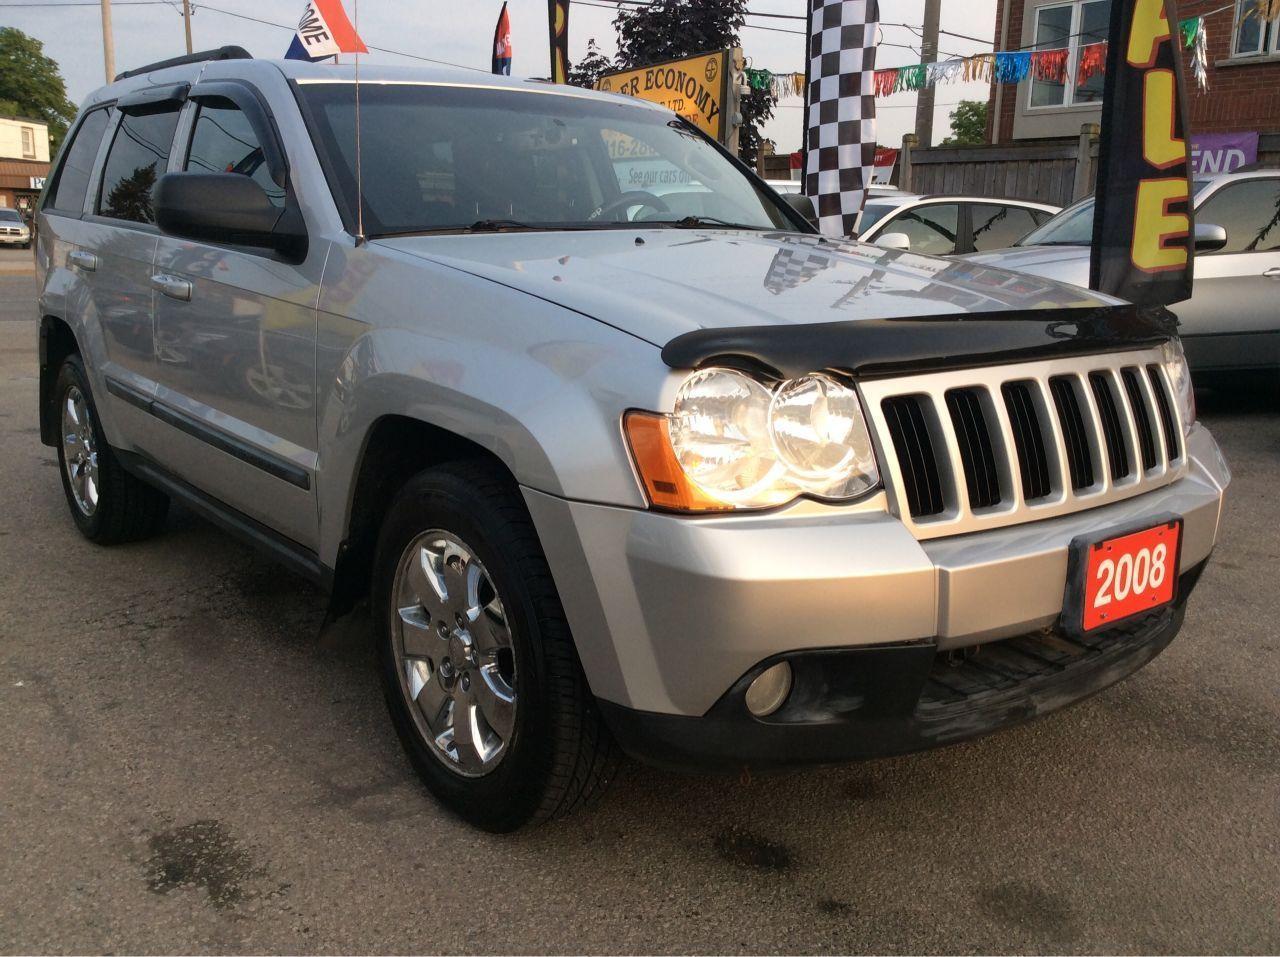 2008 Jeep Grand Cherokee Laredo - Diesel